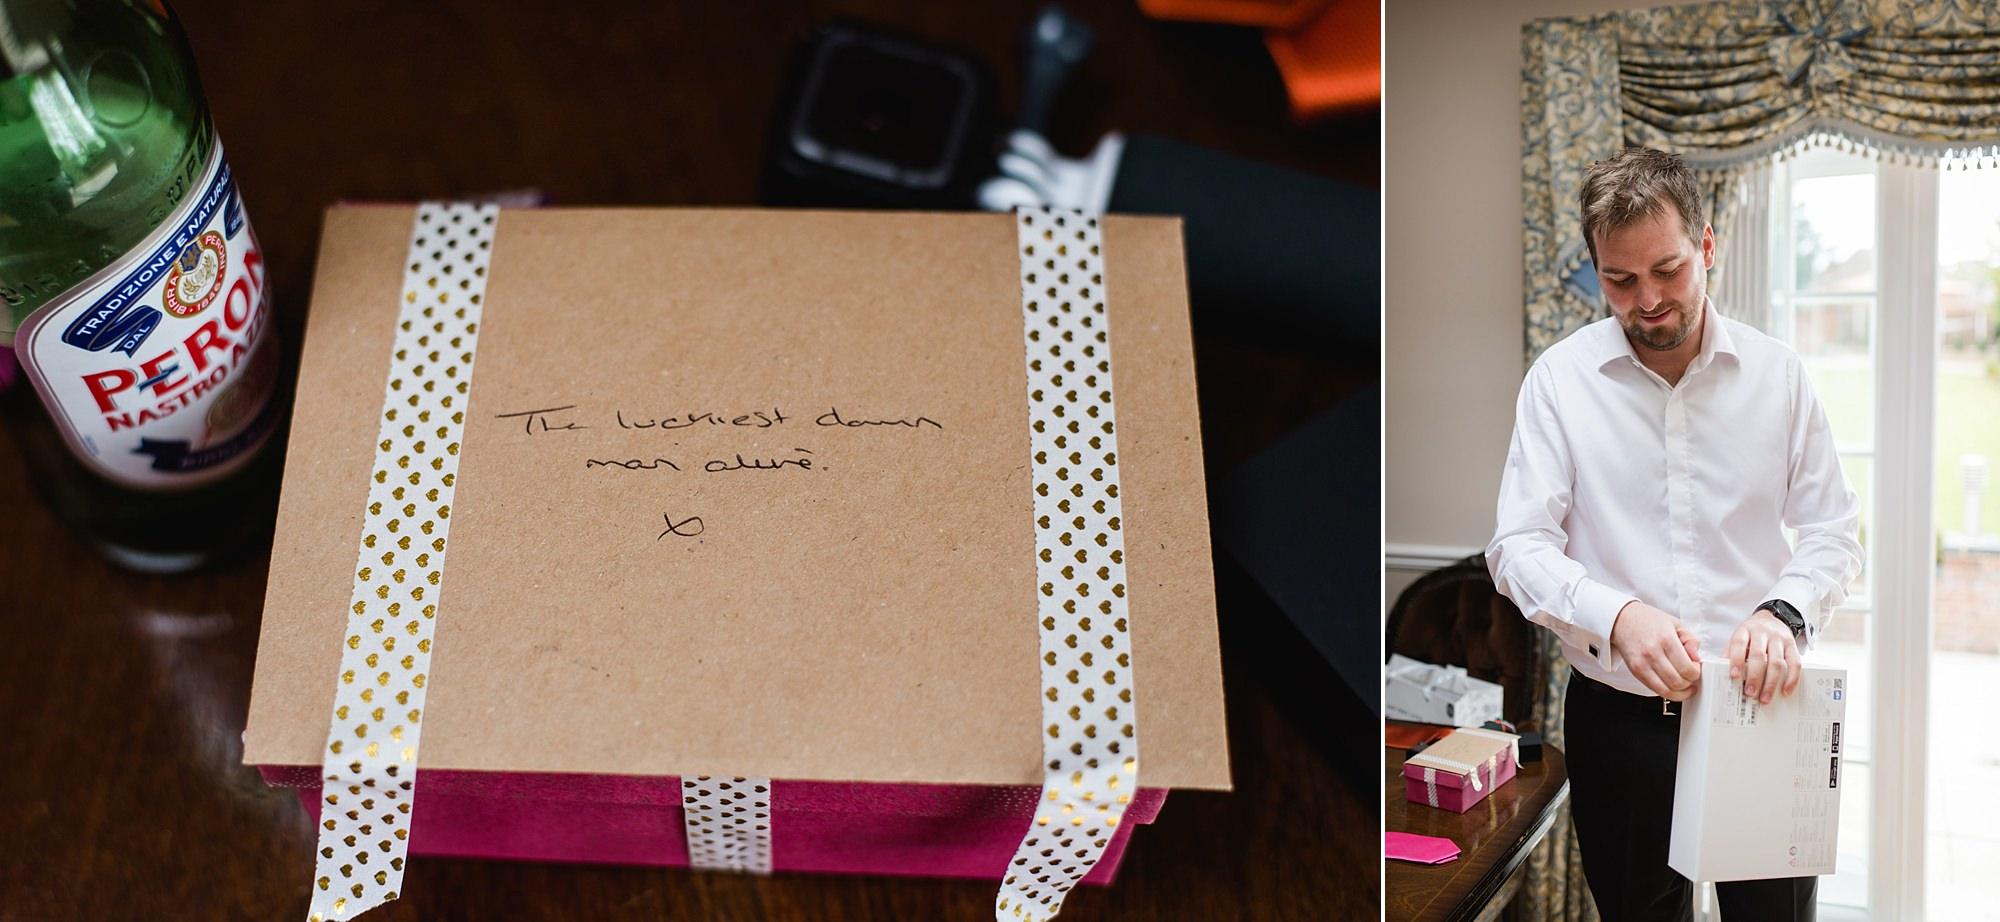 Fun London Wedding bride's gift to groom